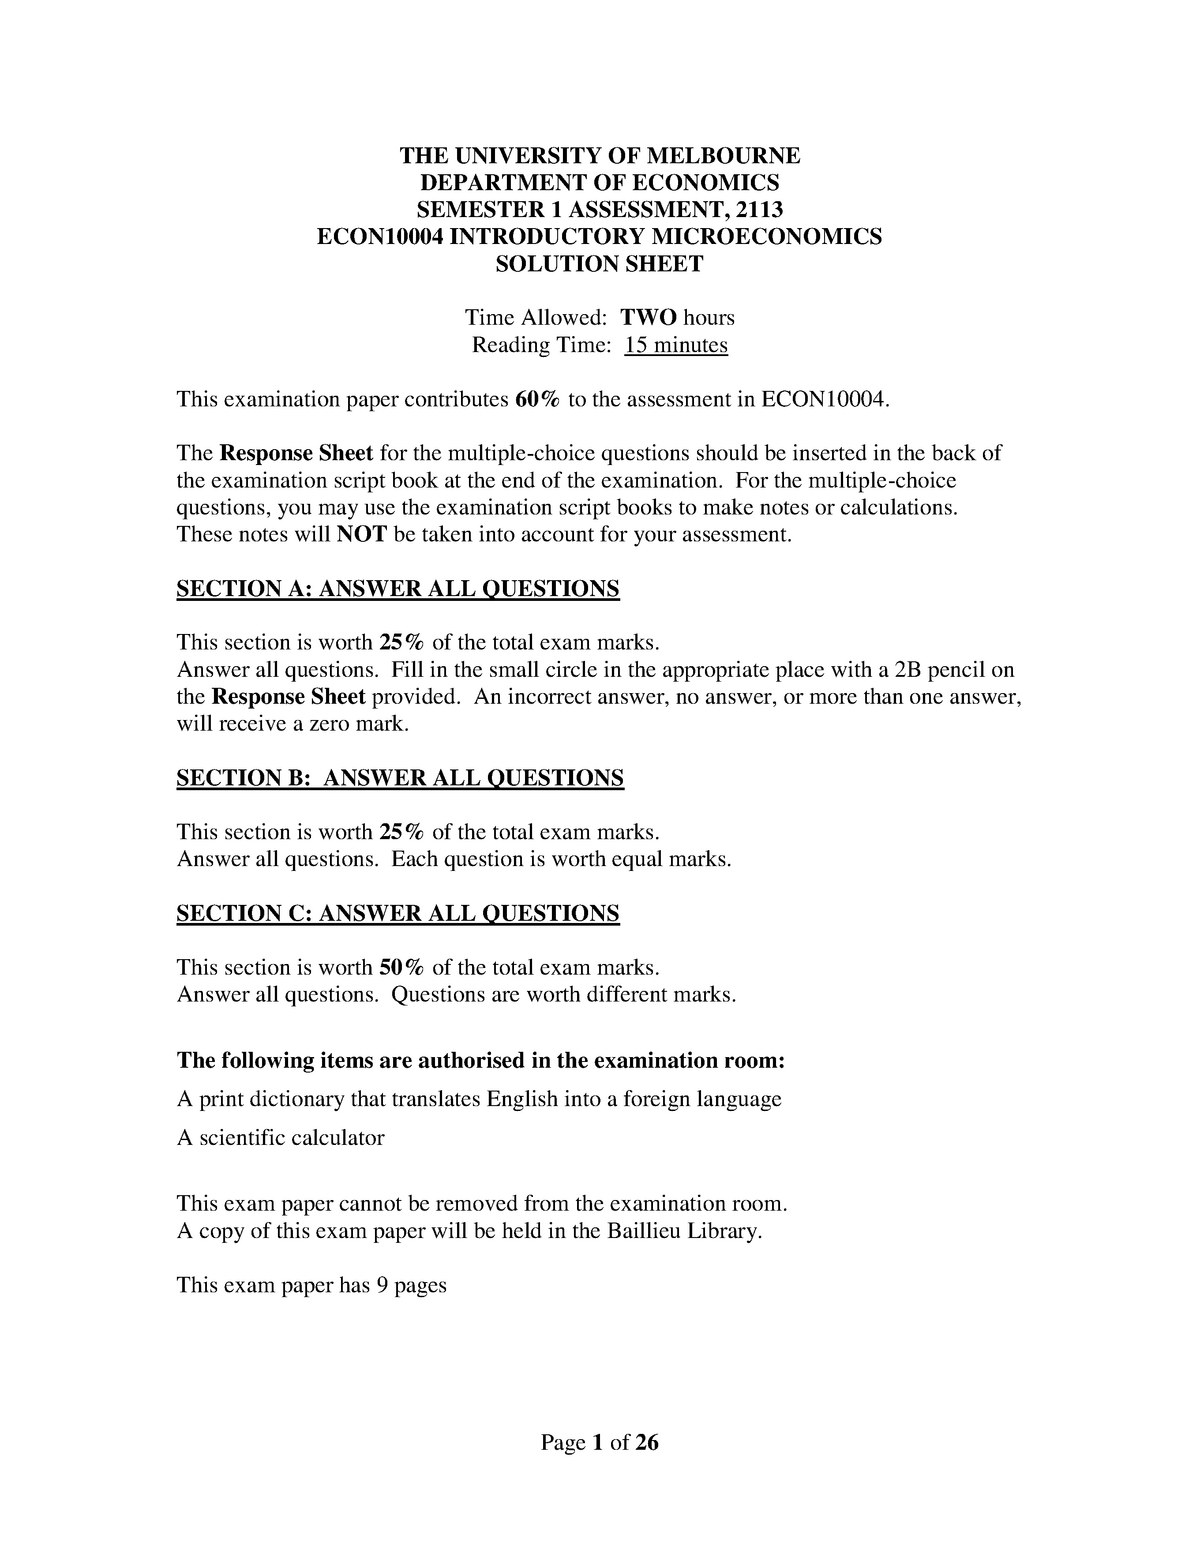 Exam Sem 1 2013 Questions and Answers doc - ECON10004 - StuDocu